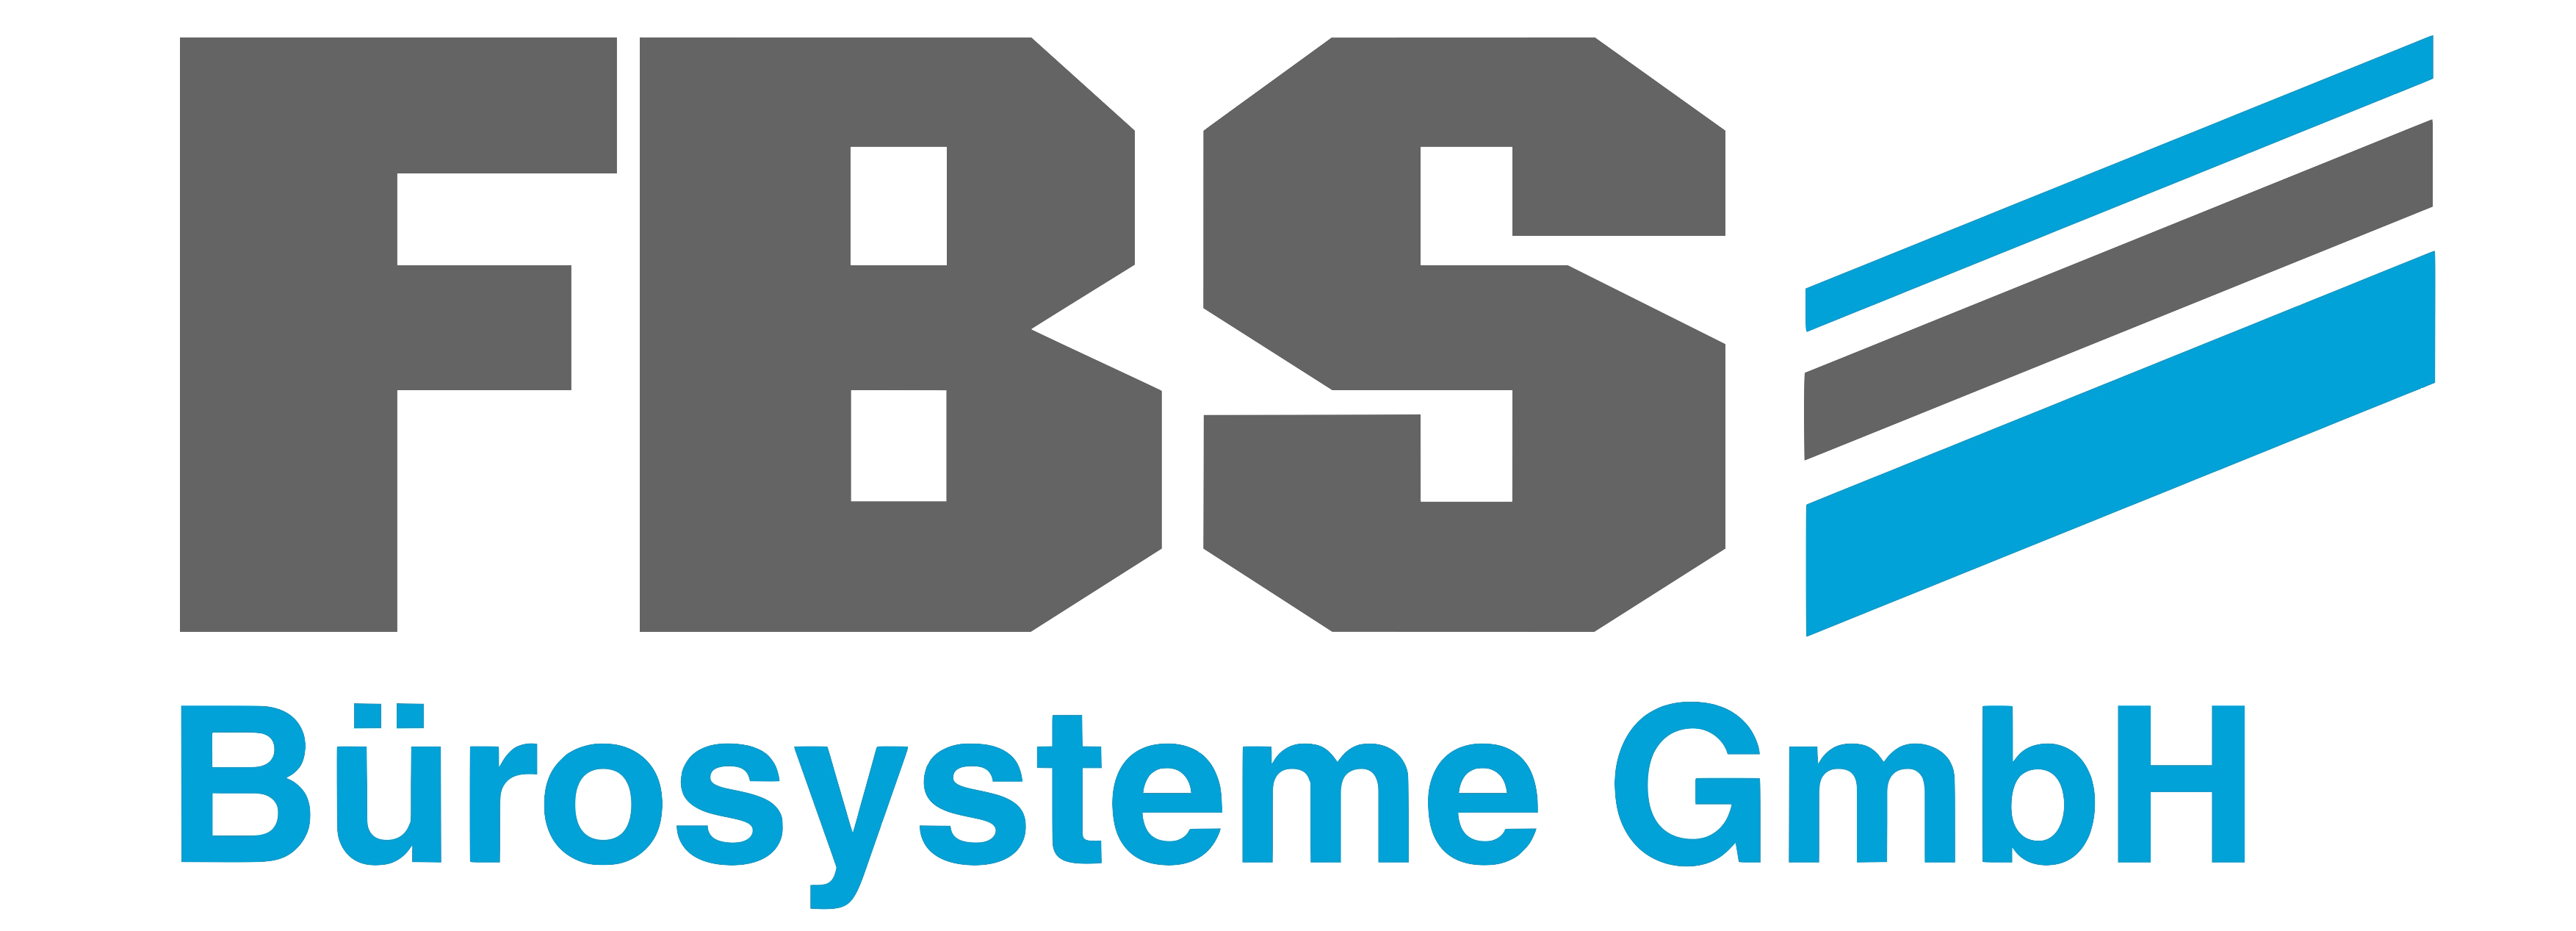 FBS BÜROSYSTEME GmbH